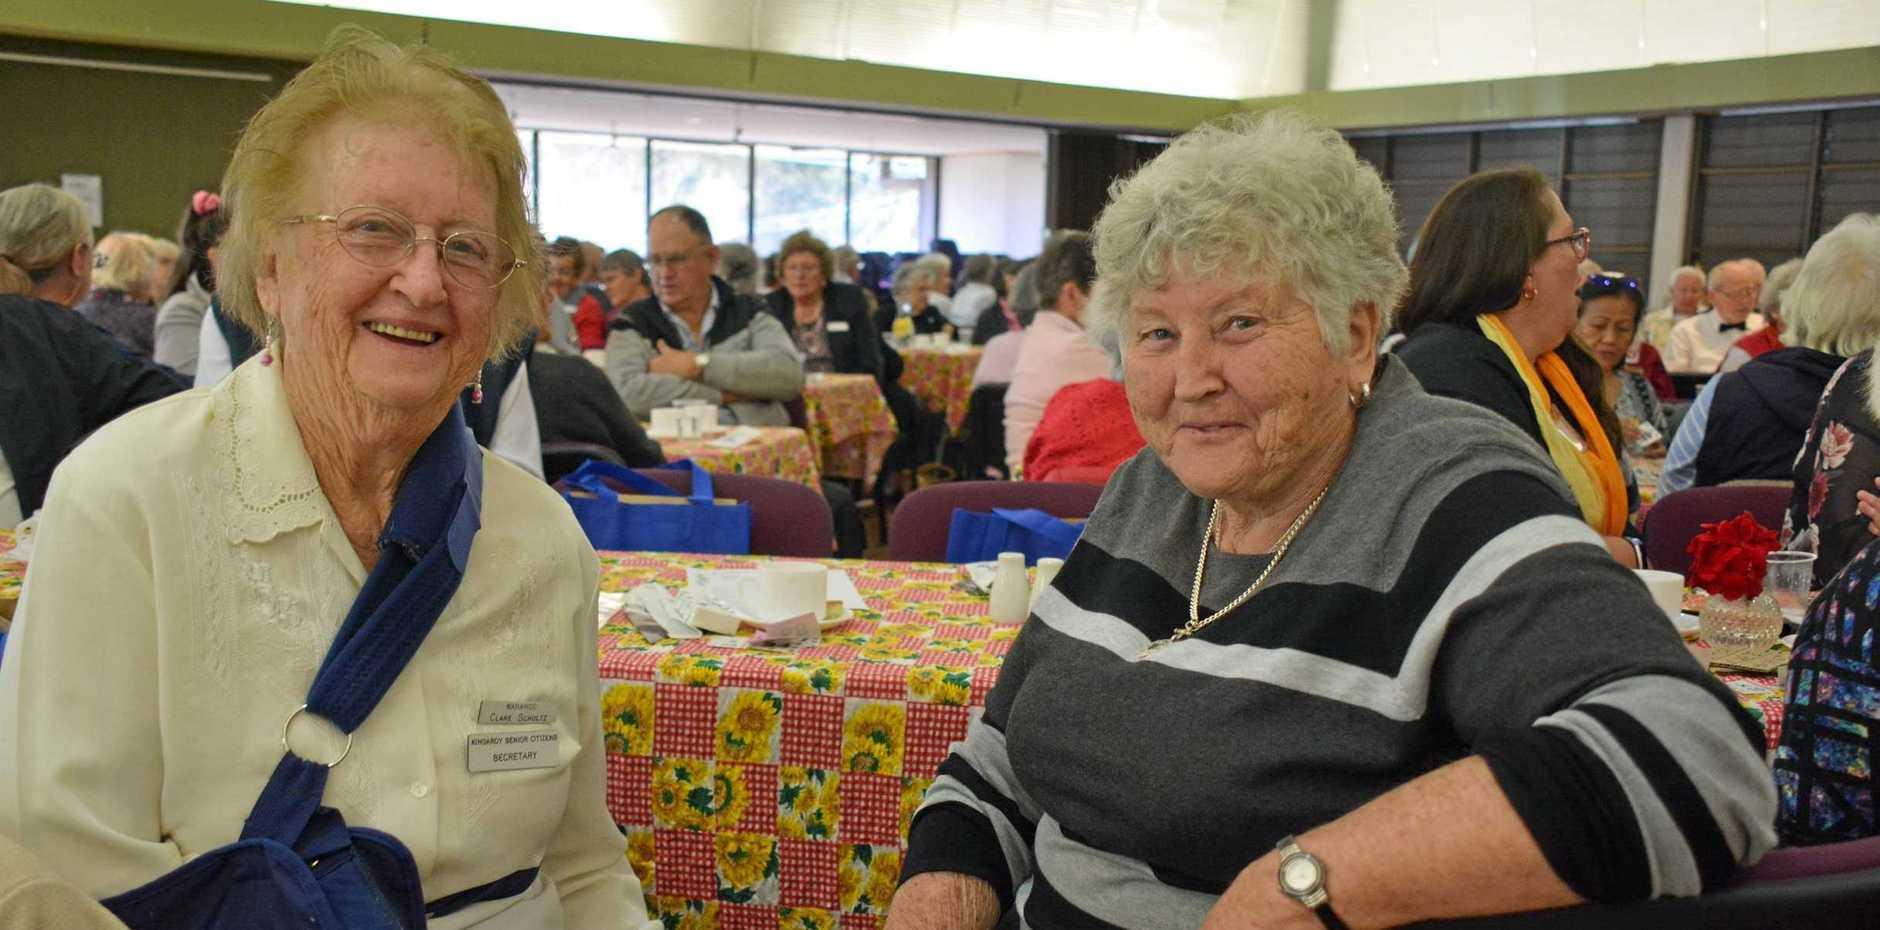 Clare Schultz and Val Harm enjoy the Nanango Seniors Week event.